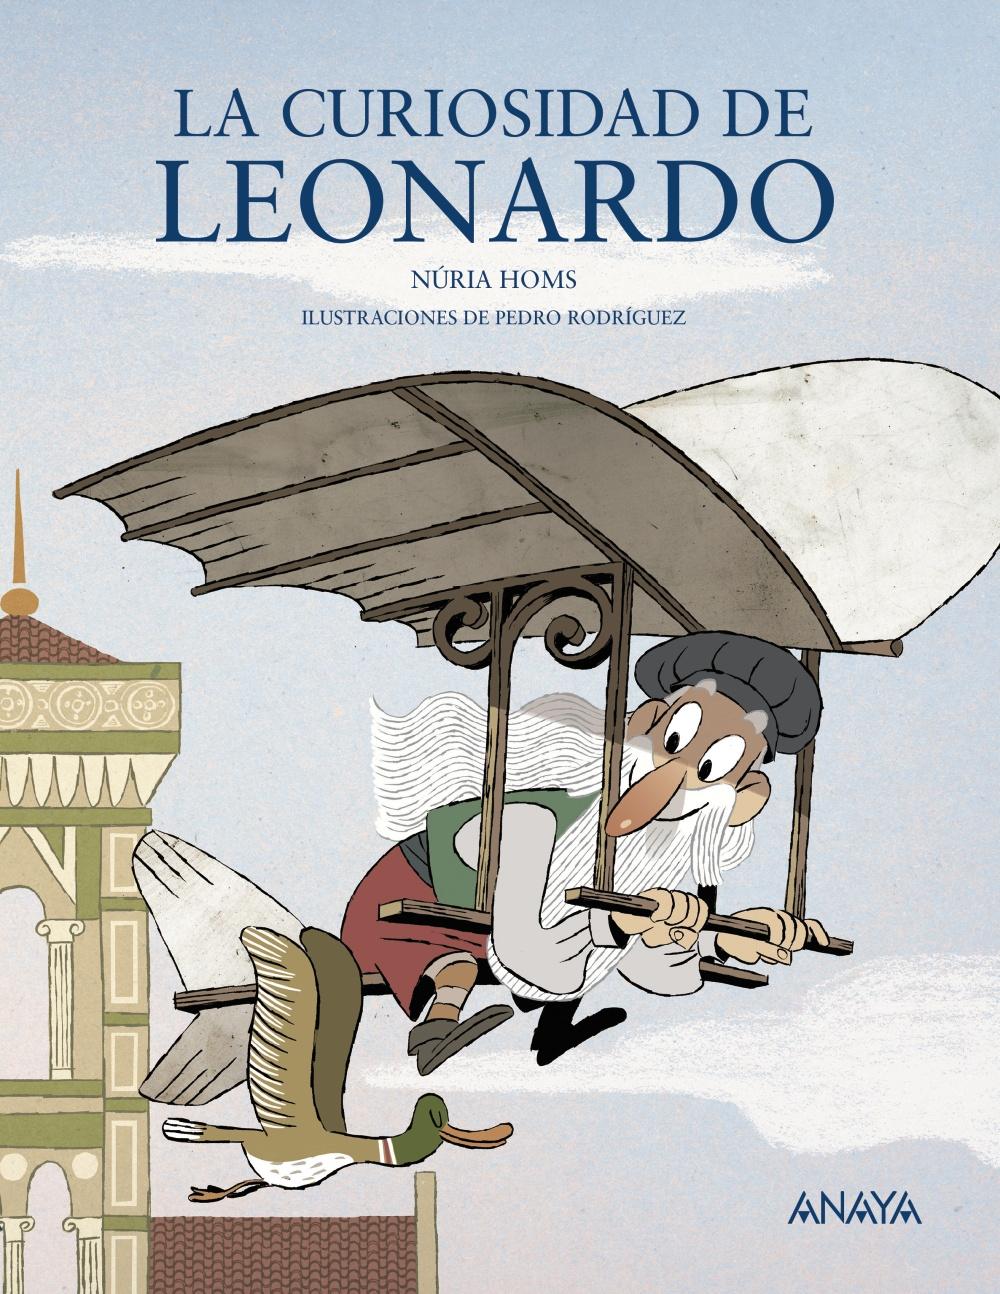 La curiosidad de Leonardo, de Núria Homs